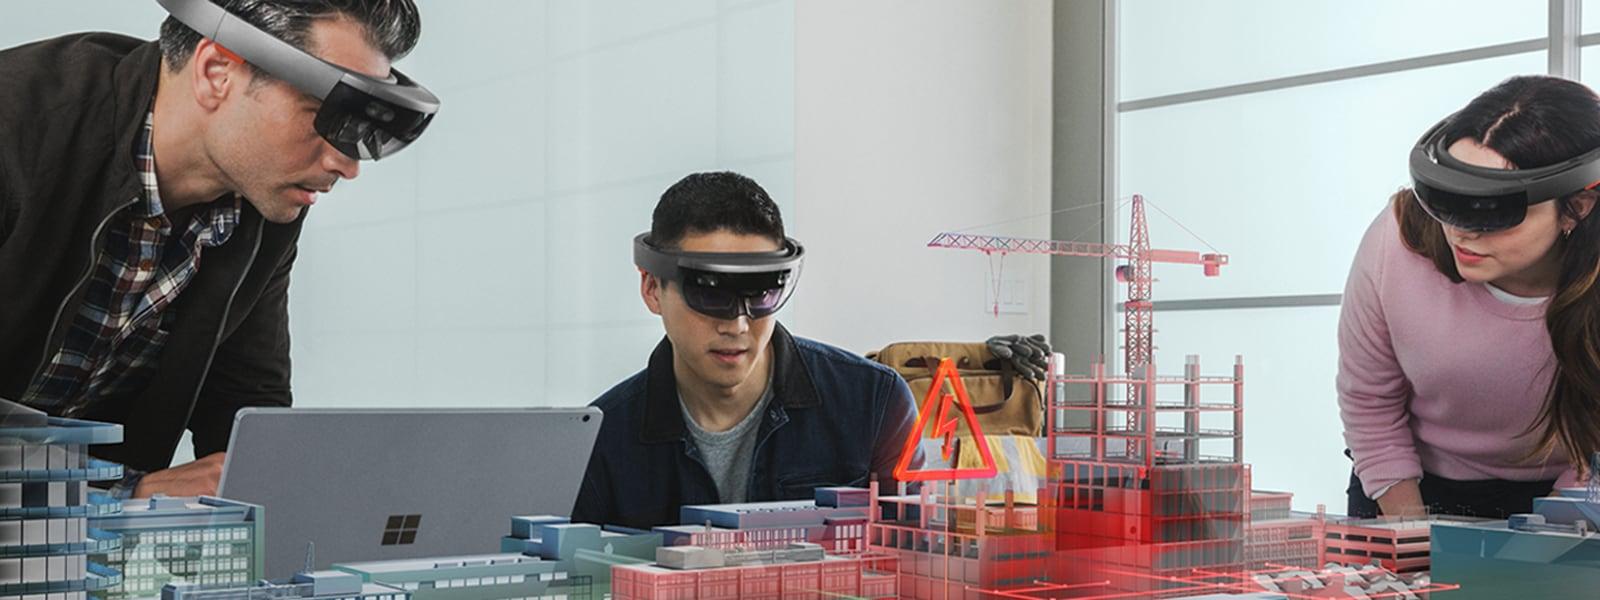 HoloLensを使用している三人